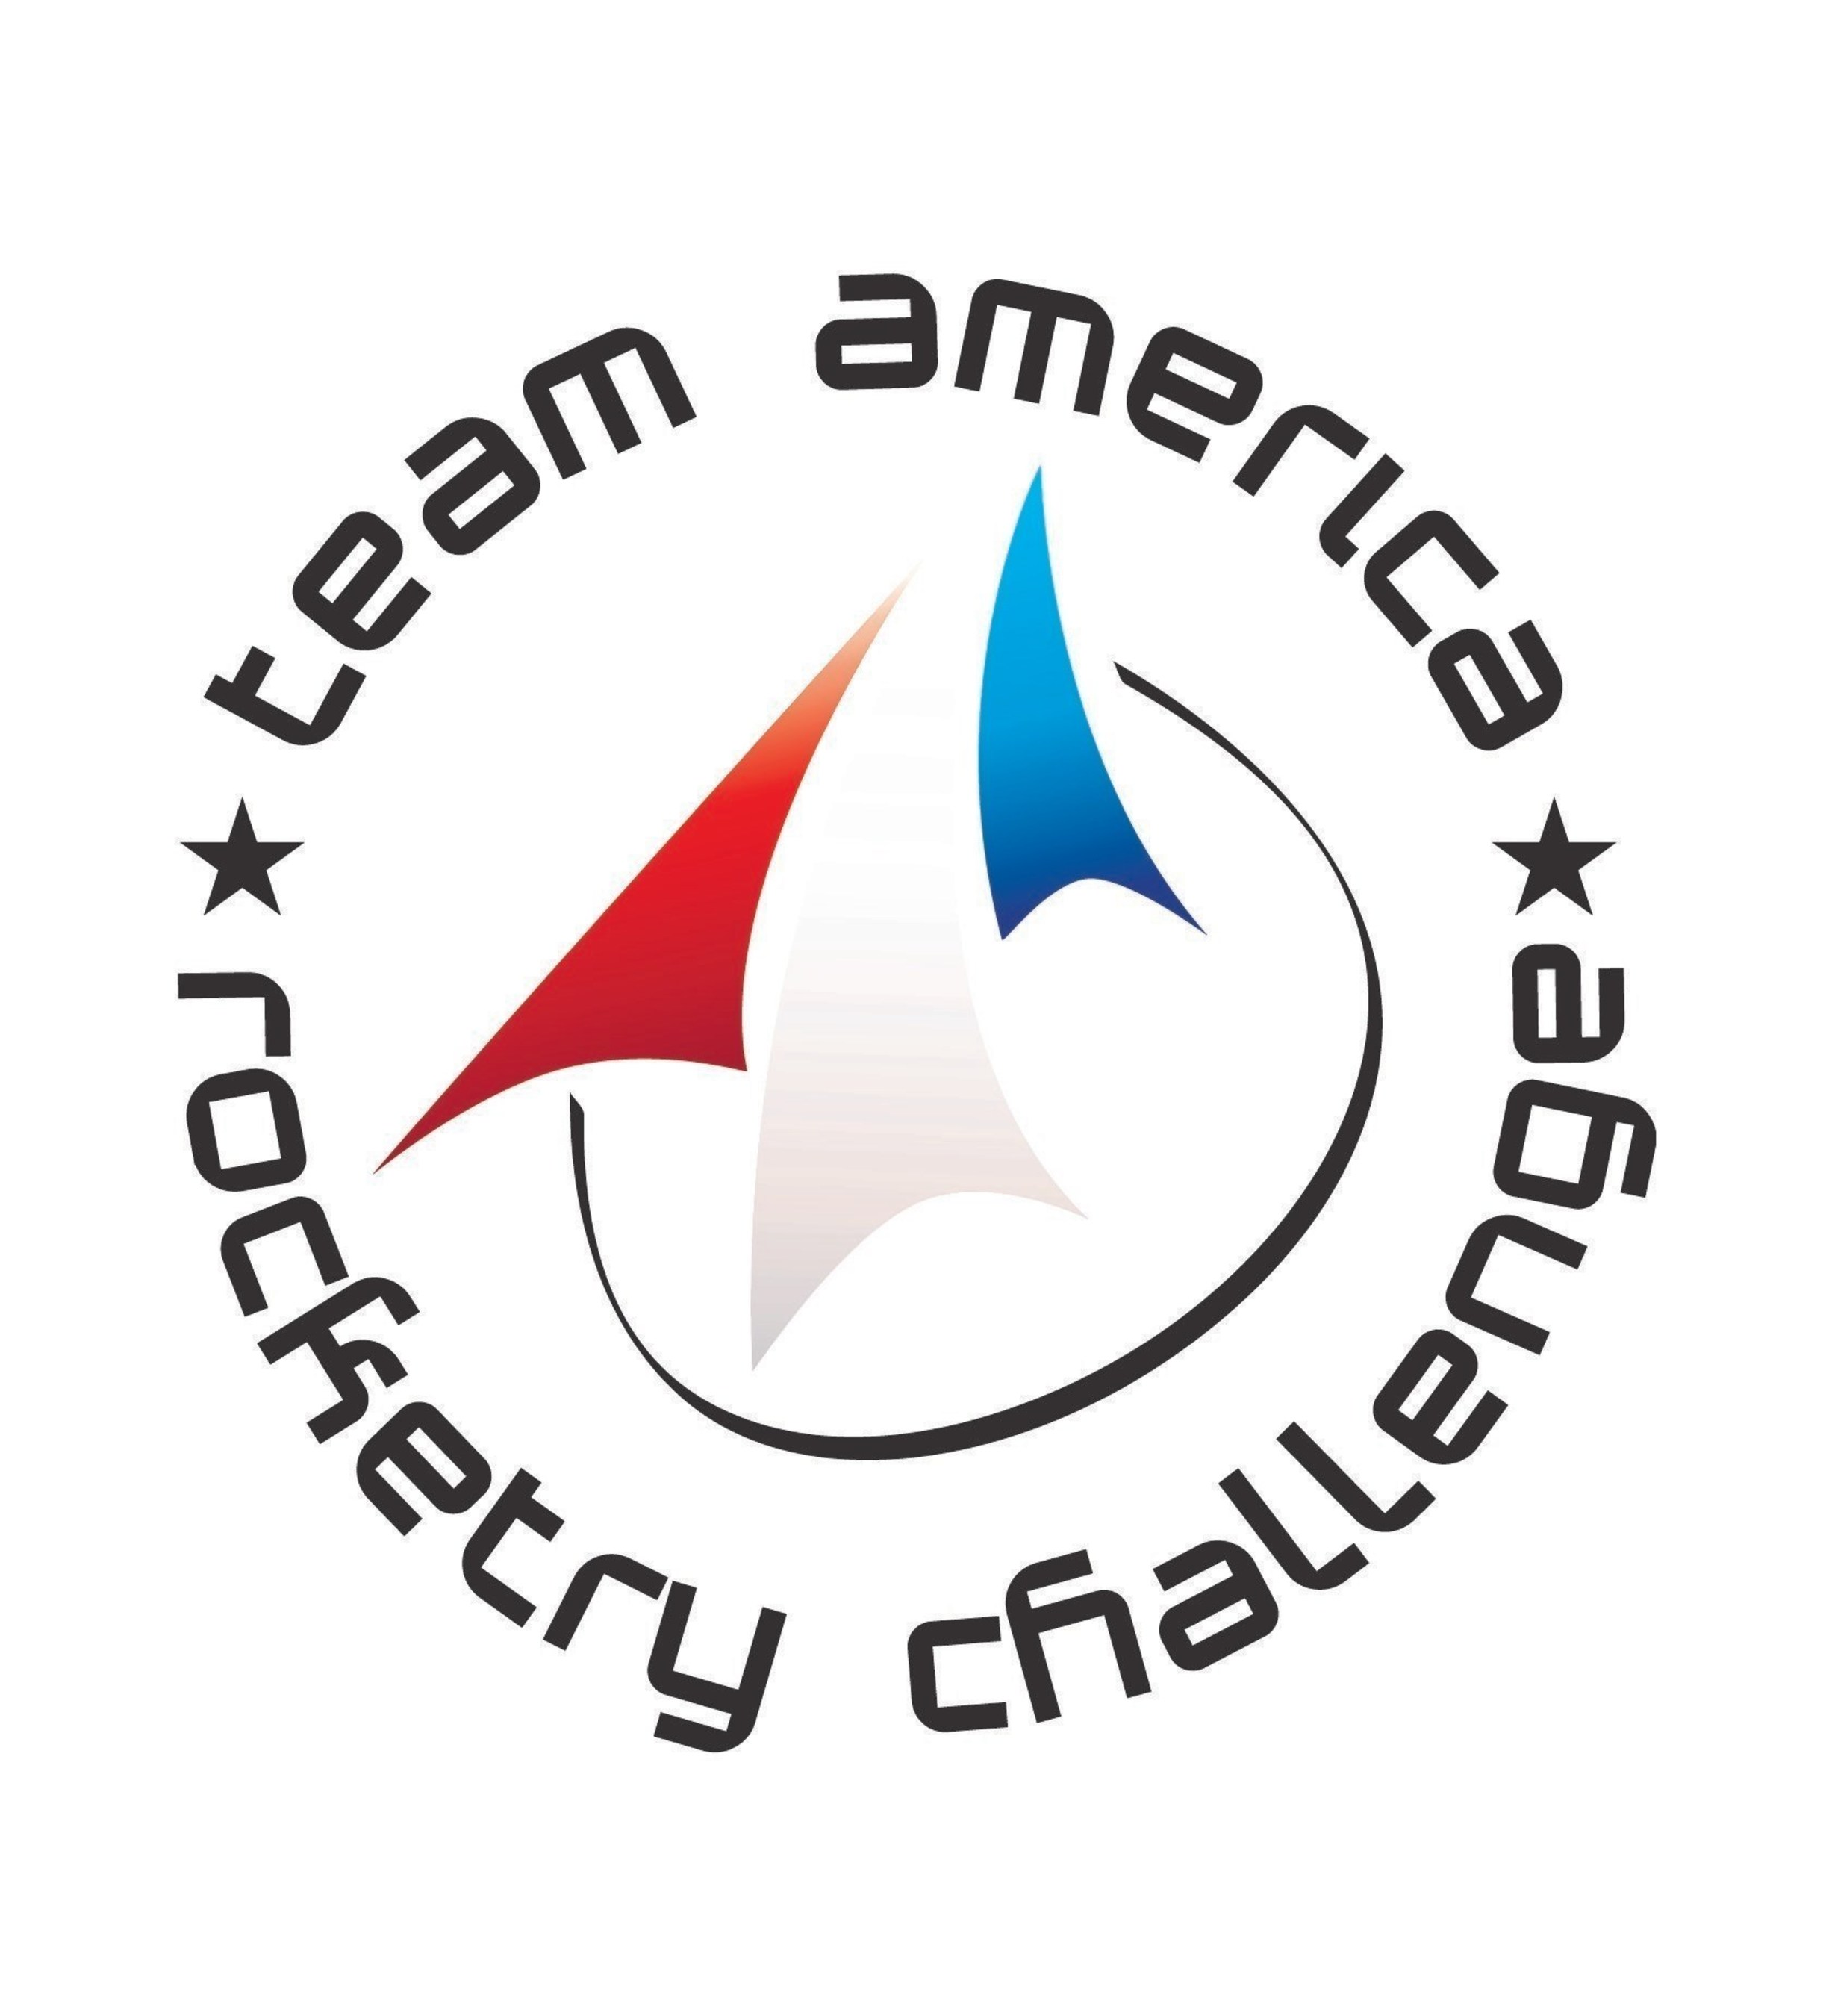 Team America Rocketry Challenge